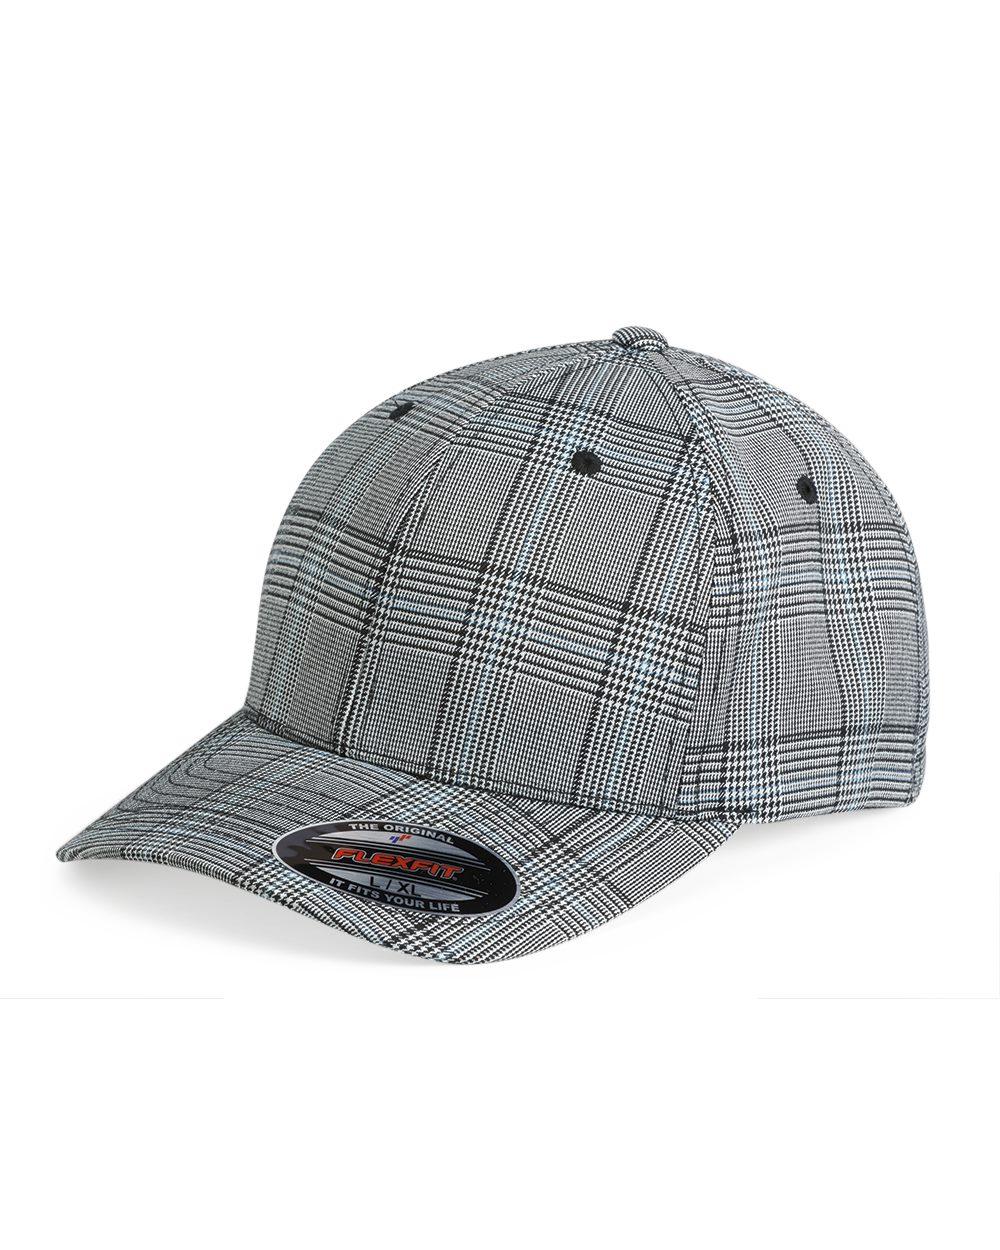 Flexfit 6196 - Check Cap